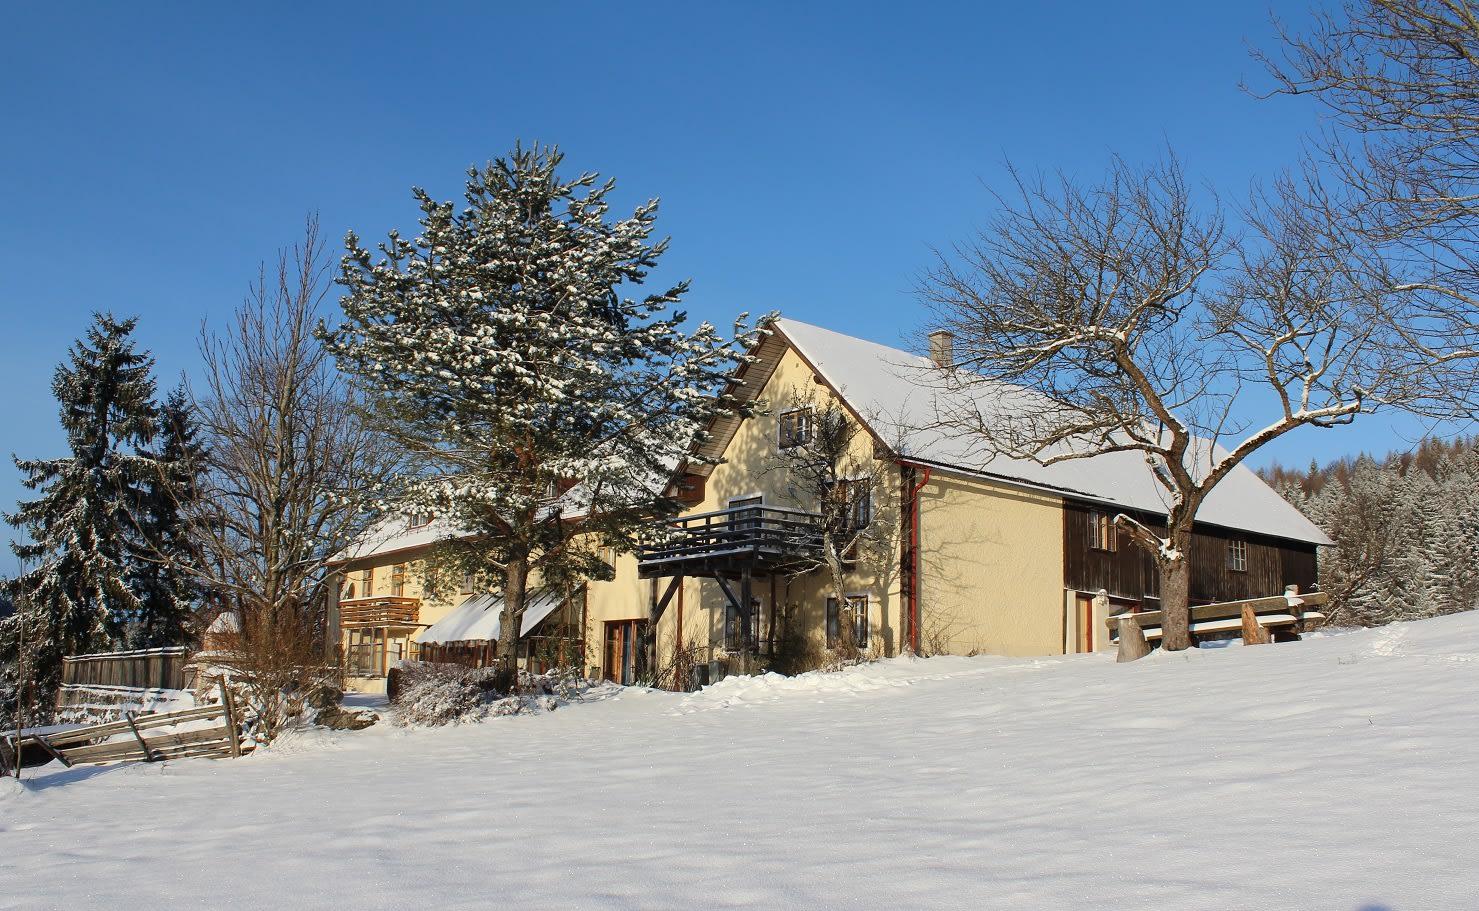 Hirmhof Winter